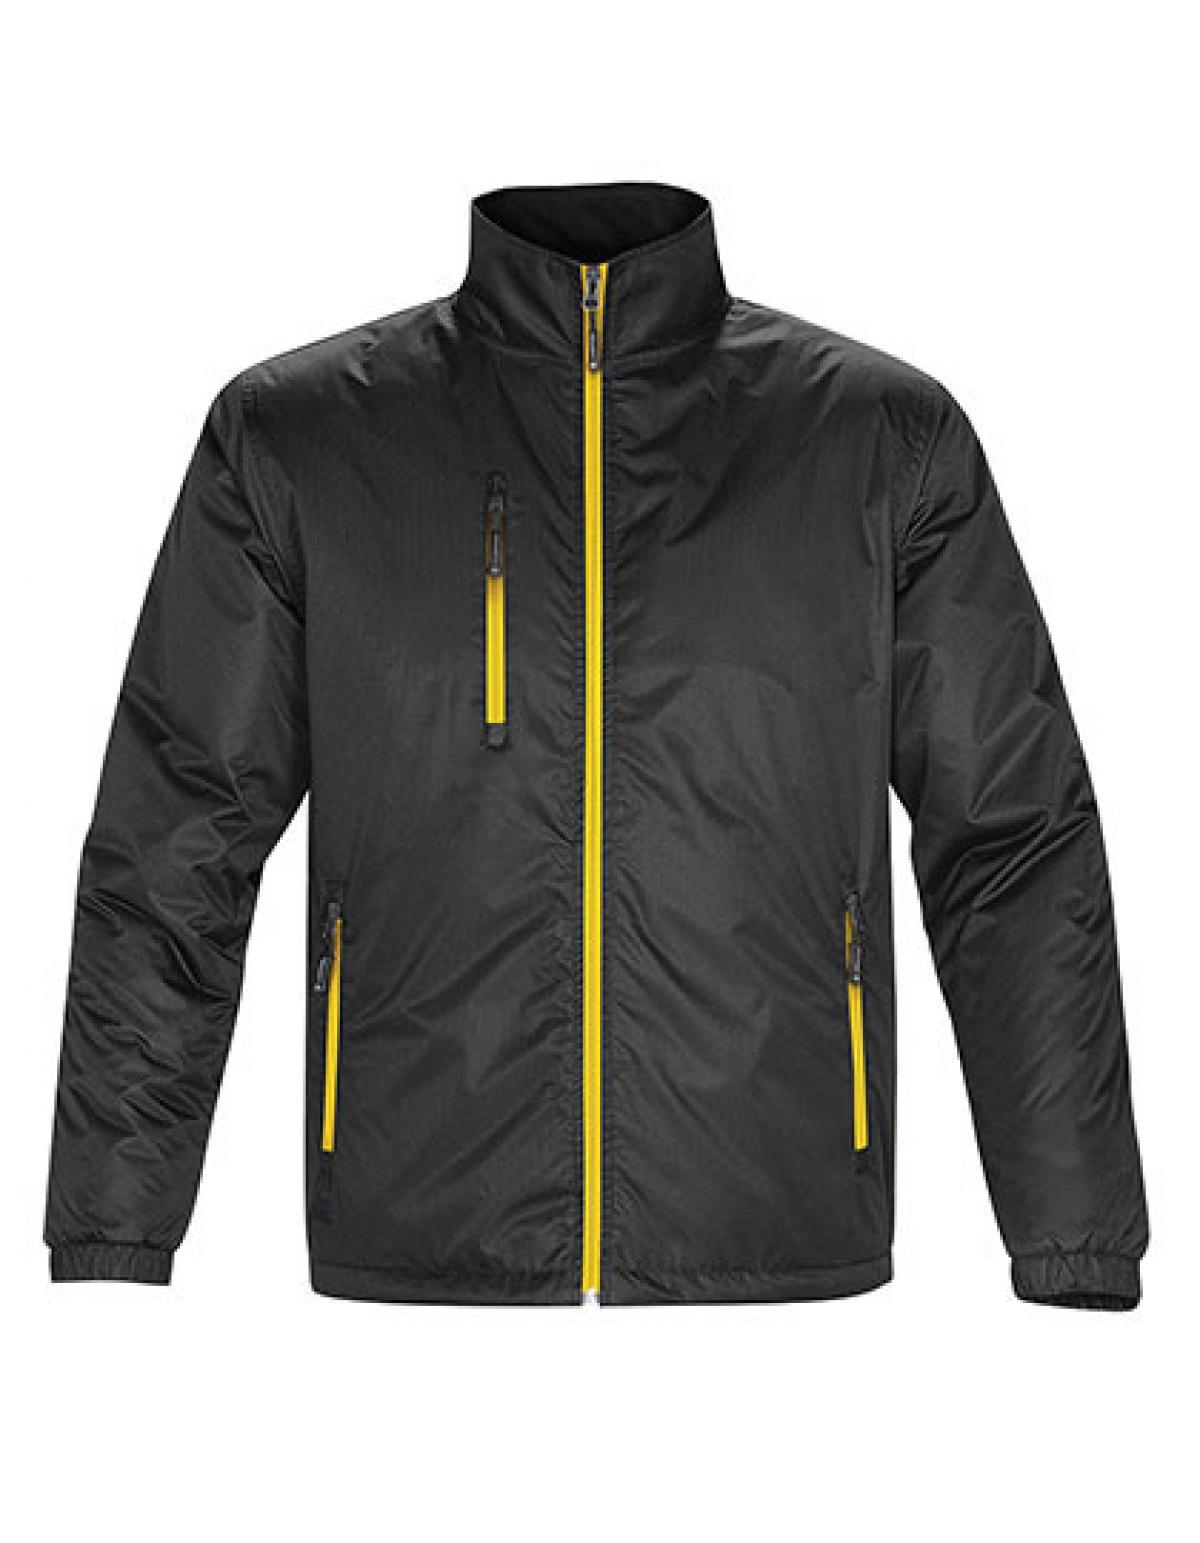 herren wintersportjacke axis thermal jacket rexlander s. Black Bedroom Furniture Sets. Home Design Ideas